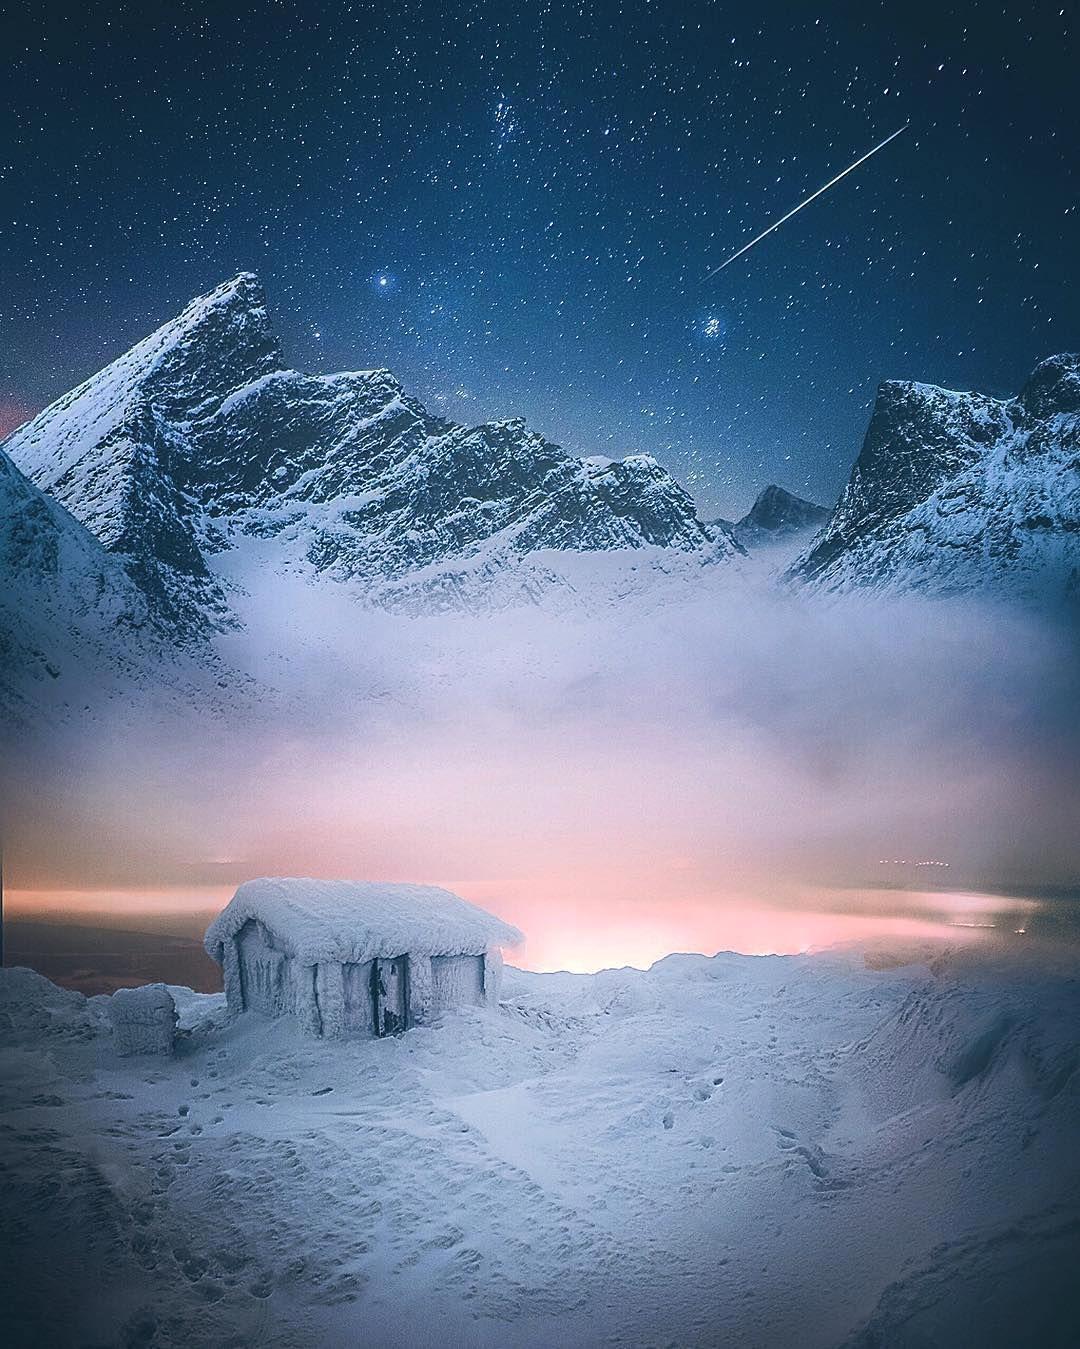 42.7K vind-ik-leuks, 159 reacties - EARTHOFFICIAL (@earthofficial) op Instagram: 'Above the clouds. | Photography by © Juuso Hämäläinen (@juusohd) #EarthOfficial'